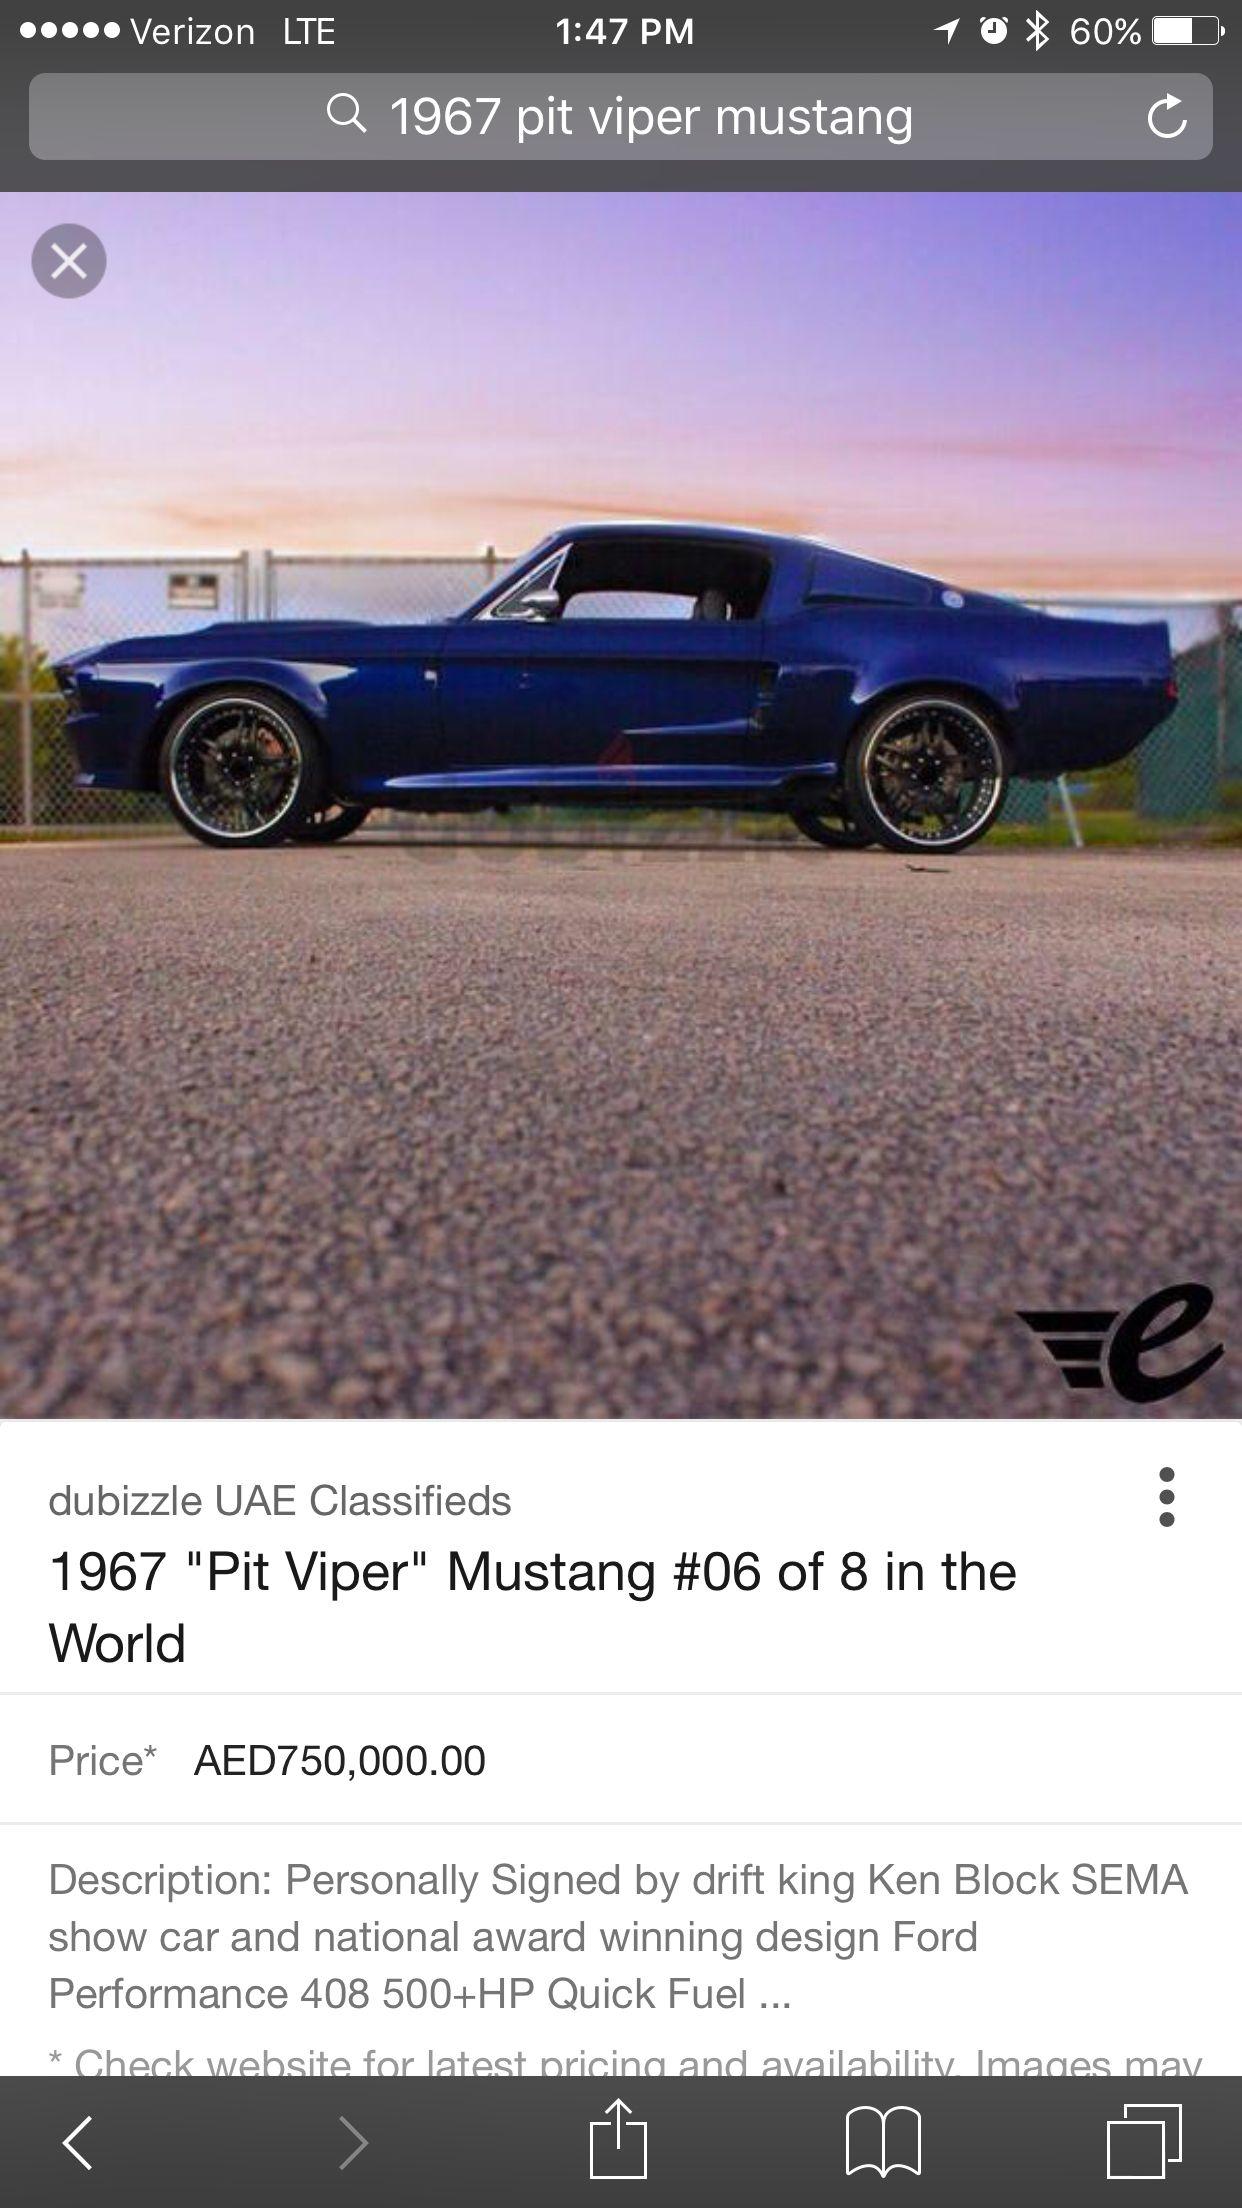 Pin By Jesse Nicholson On Pit Viper 1967 Mustang Pit Viper